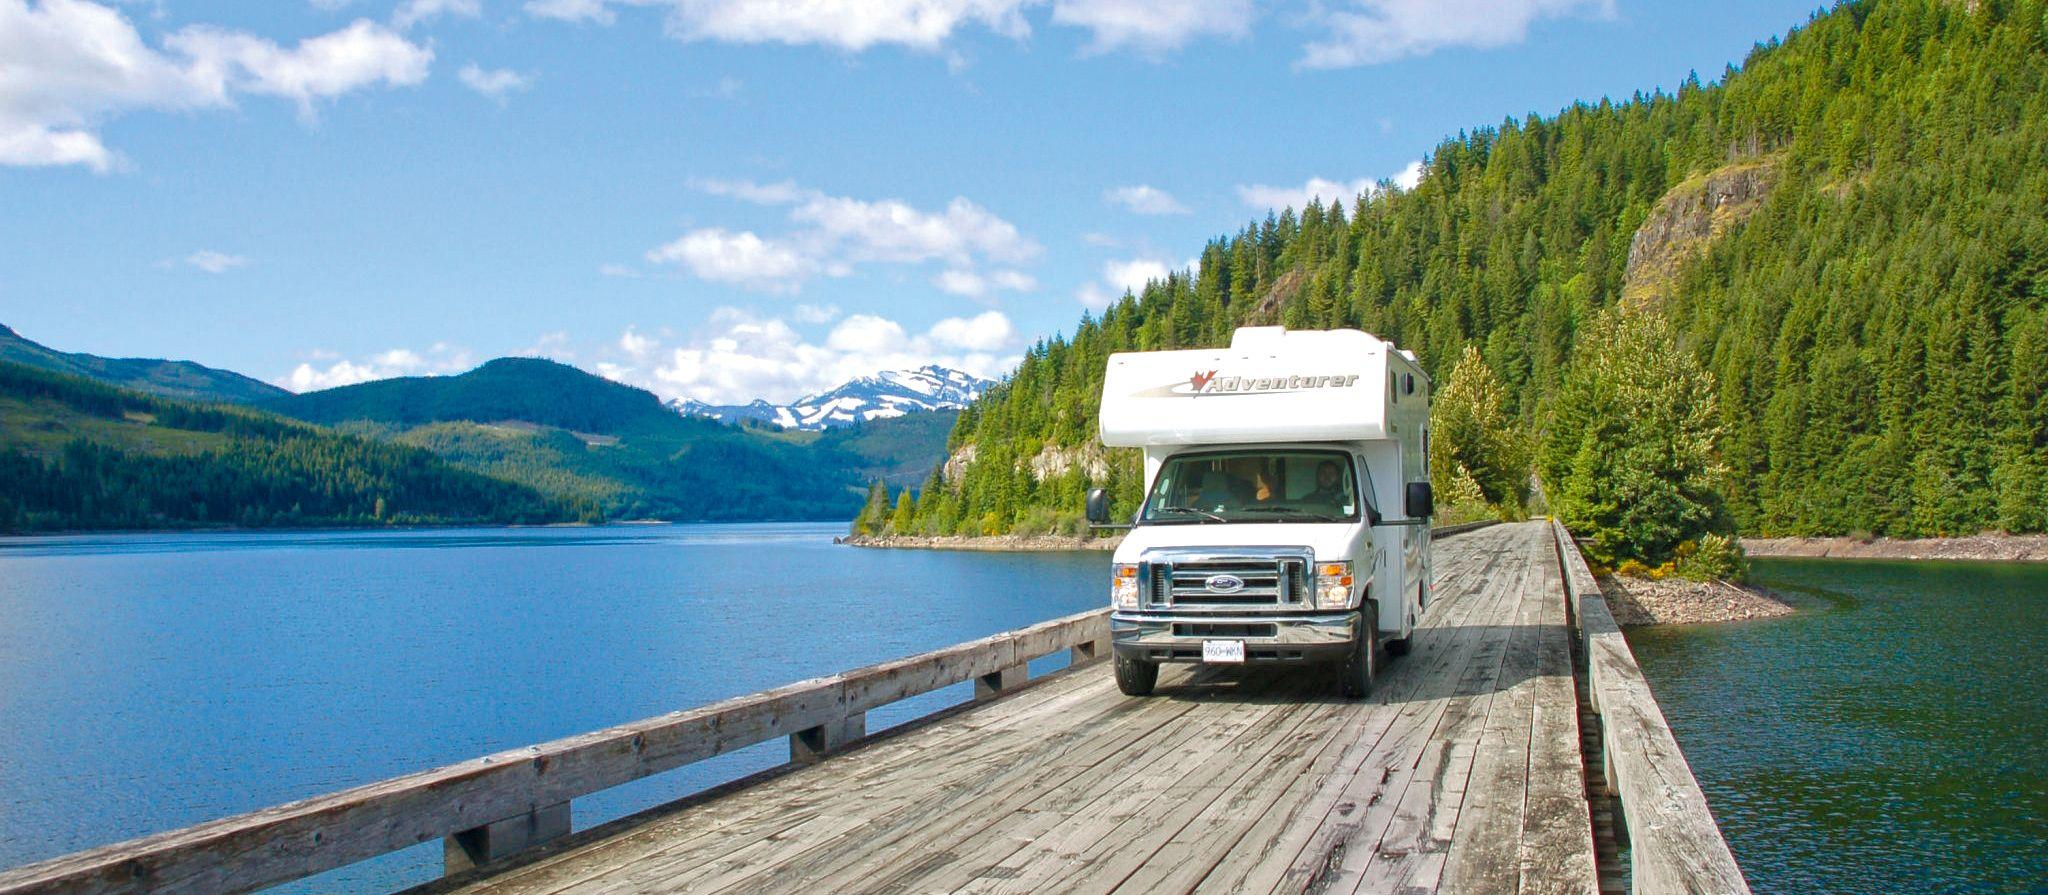 Wohnmobil in Kanada mieten & individuell reisen  CANUSA